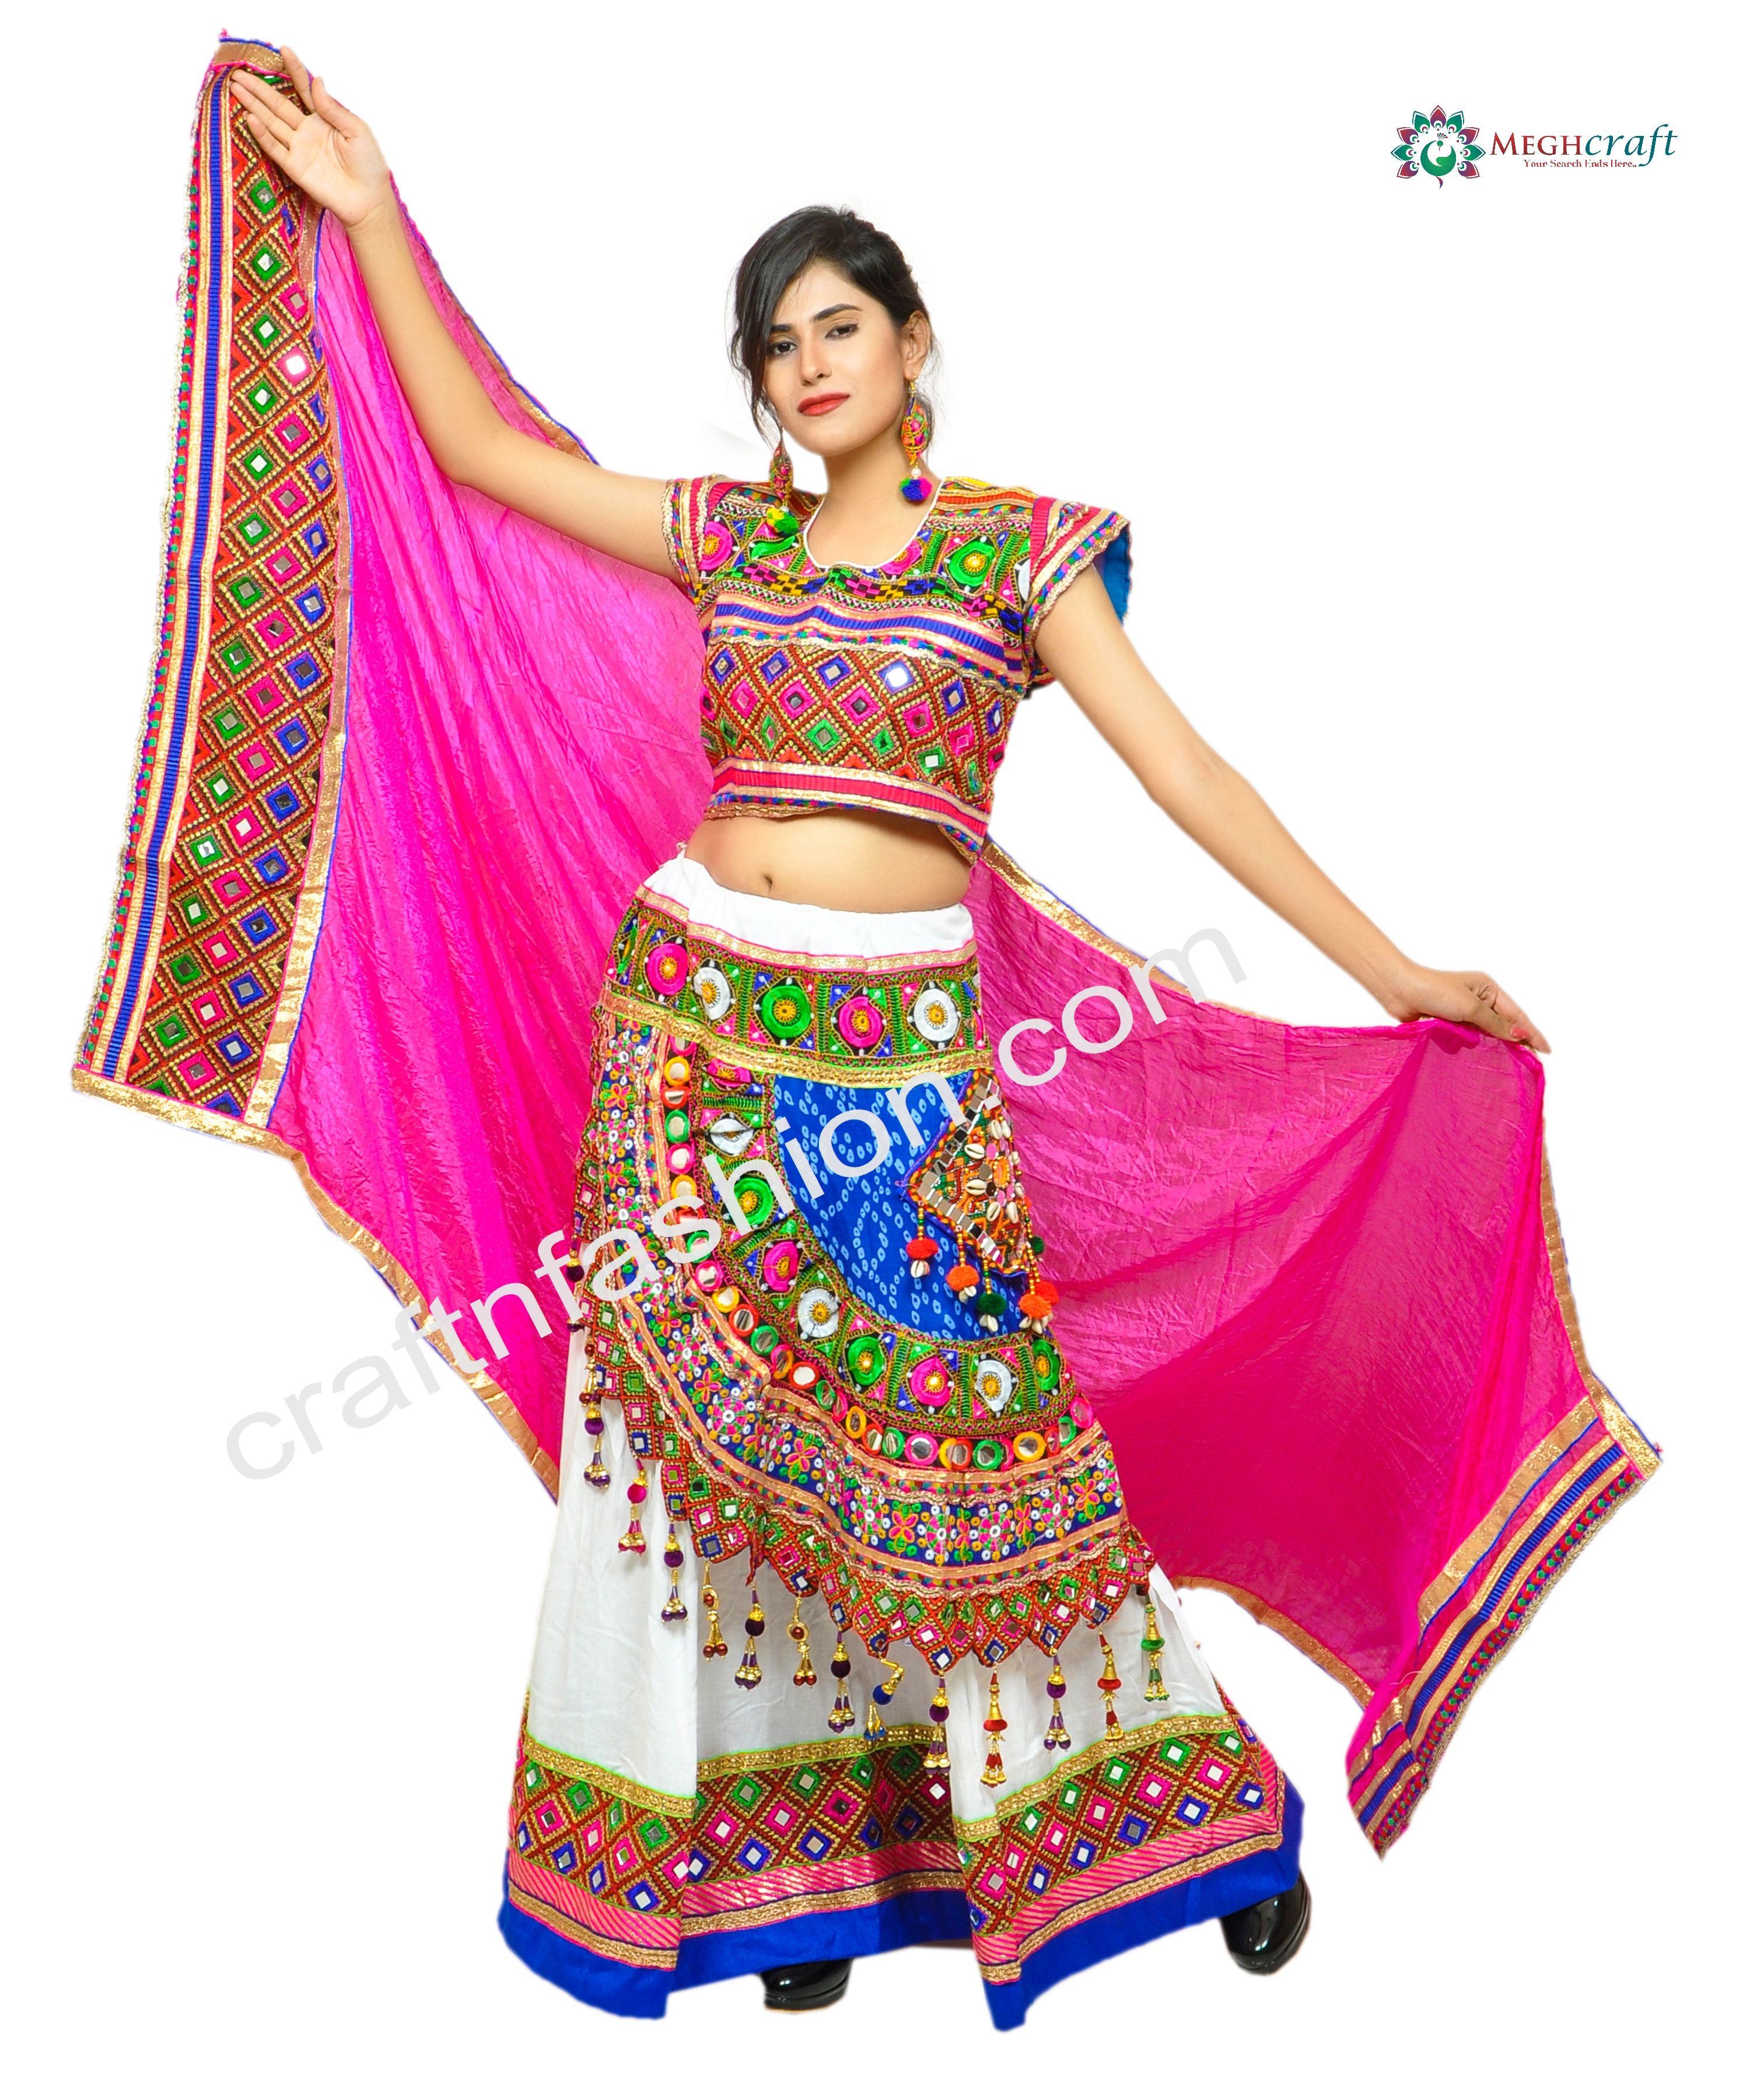 women/'s Designer Vintage Banjara tribal Embroidered Chaniya Choli Banjara Bohemian Chaniya Choli for girl Belly Dance ethnic Ghghra Choli